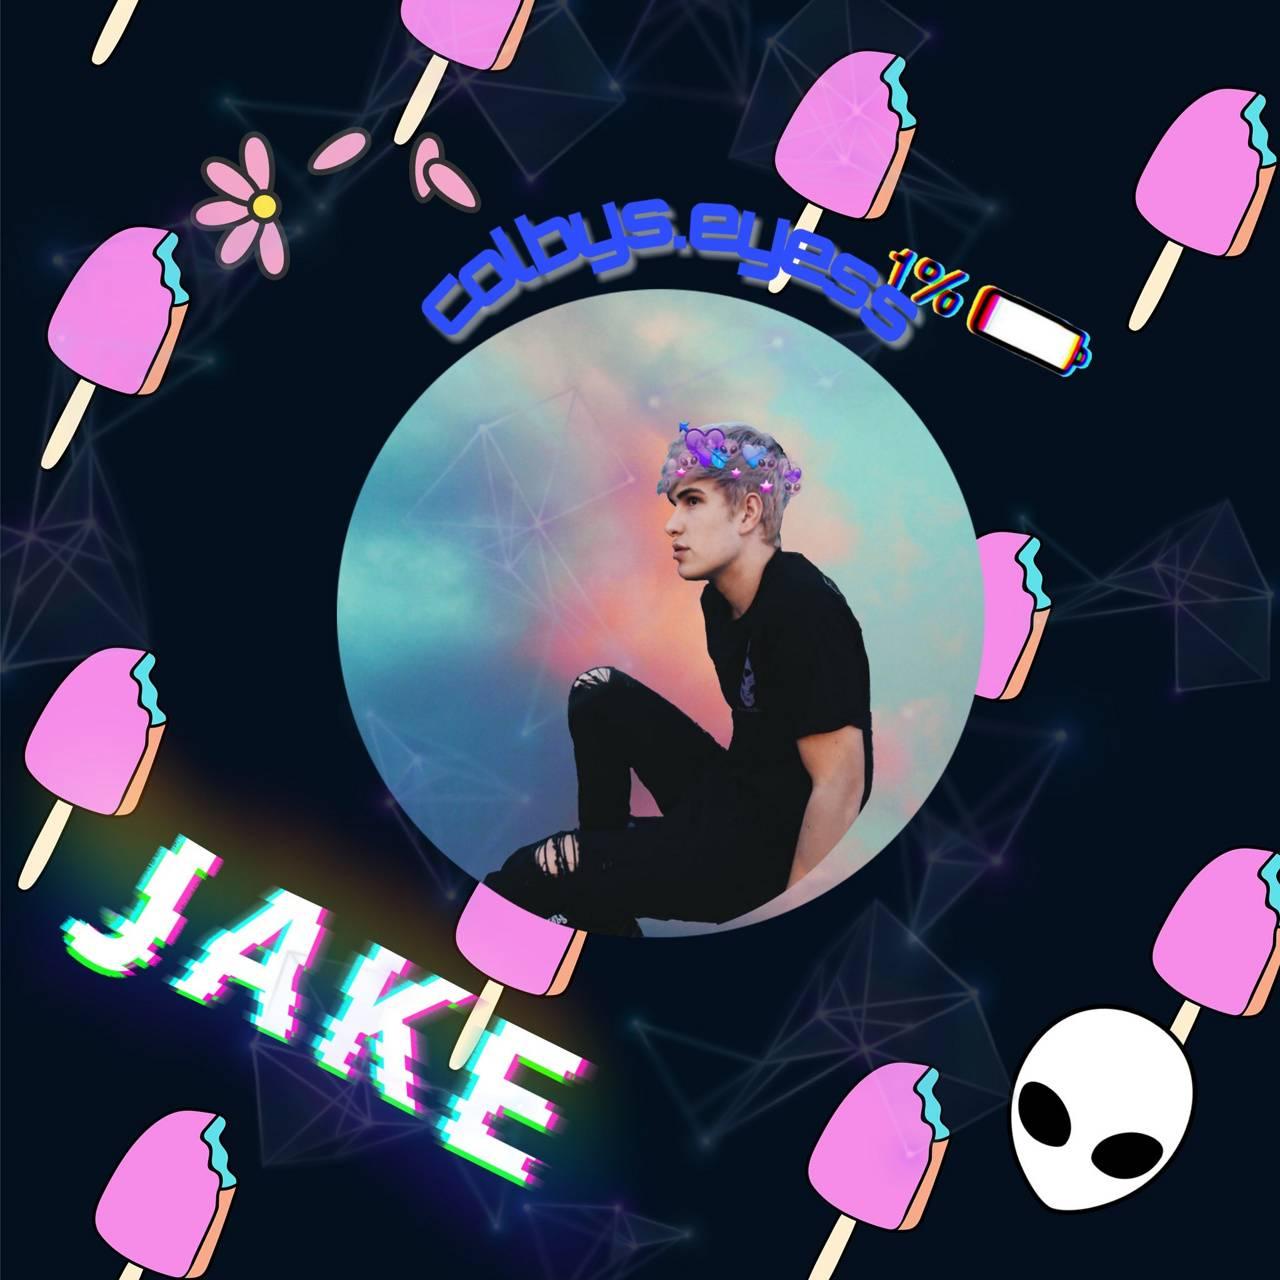 Jake Webber